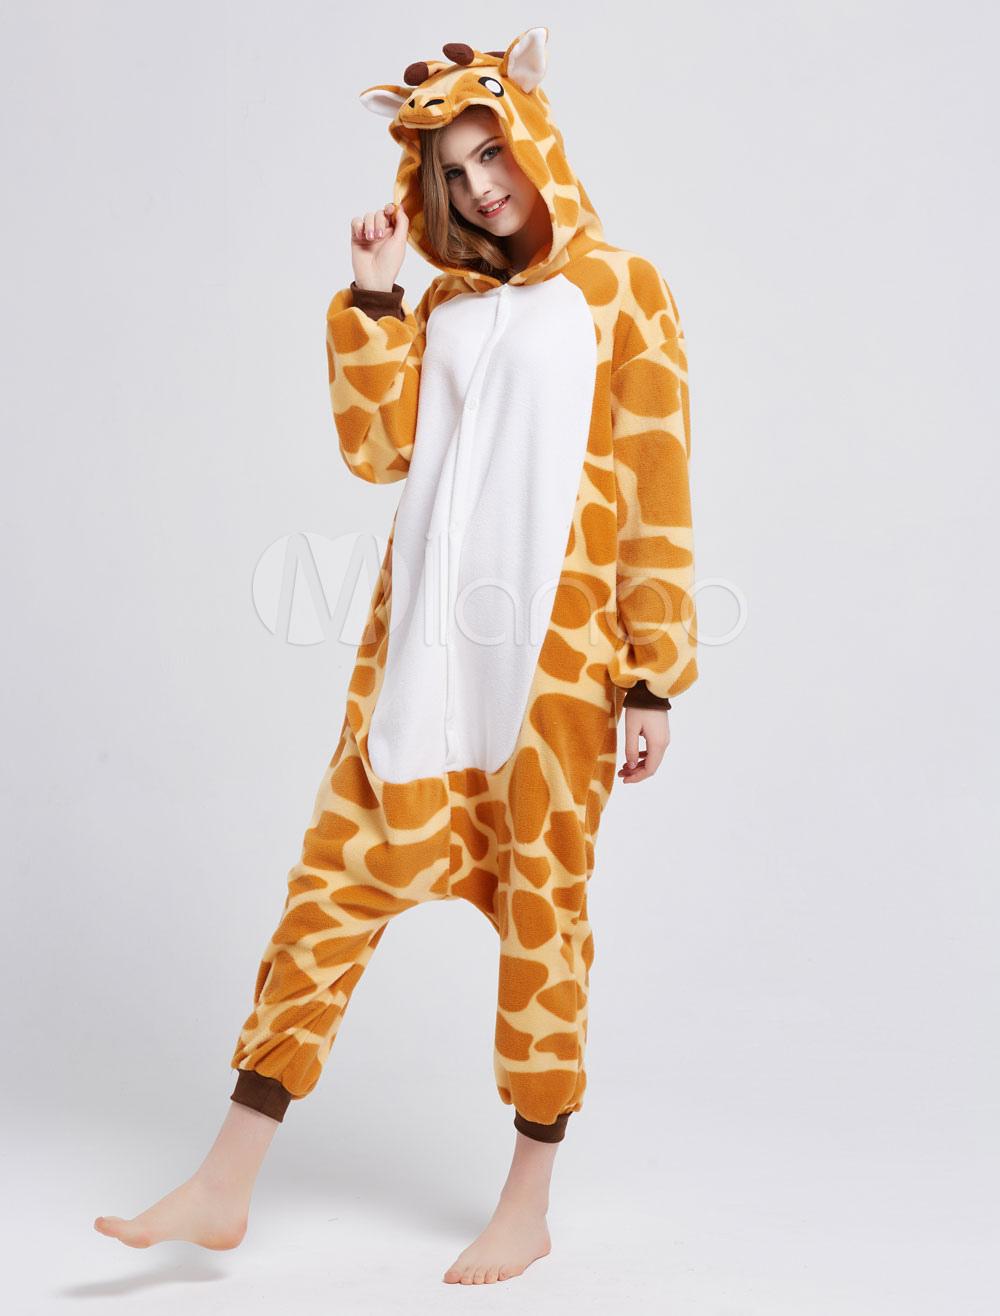 422e2c8515 ... Kigurumi Pajama Giraffe Onesie For Adult fleece Flannel Animal Costume  Halloween-No.3 ...